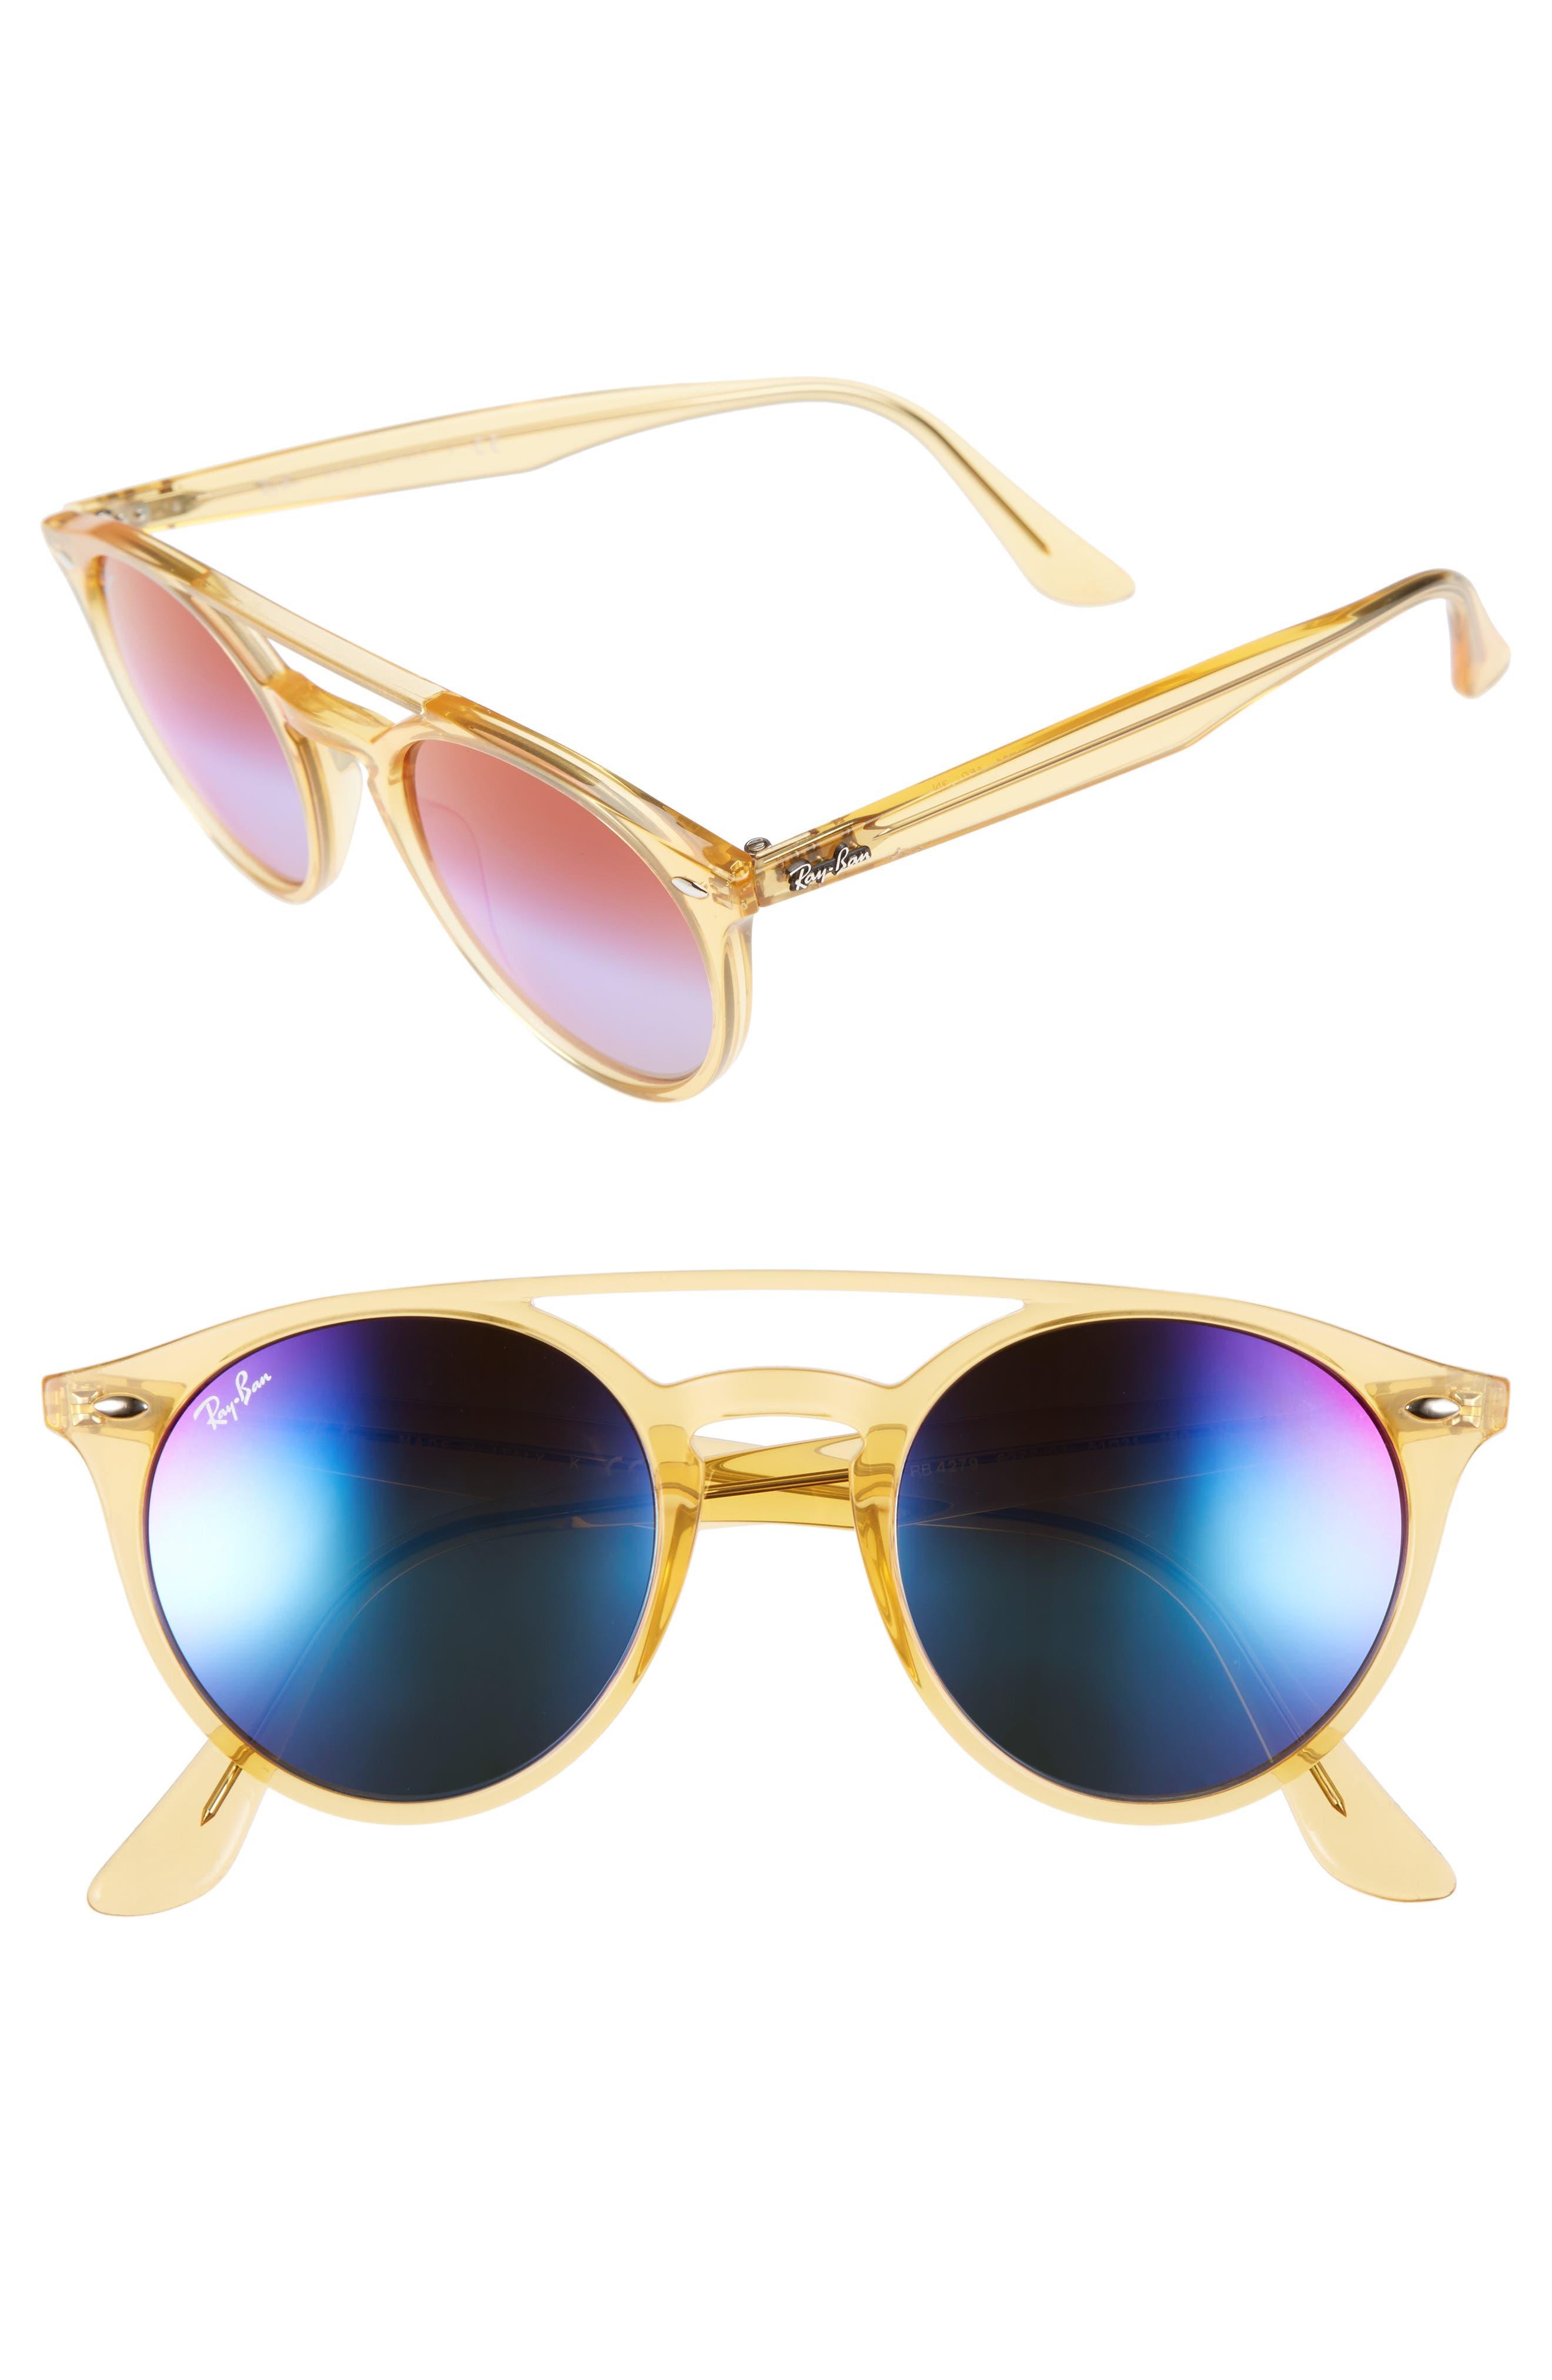 Ray-Ban 51mm Mirrored Rainbow Sunglasses